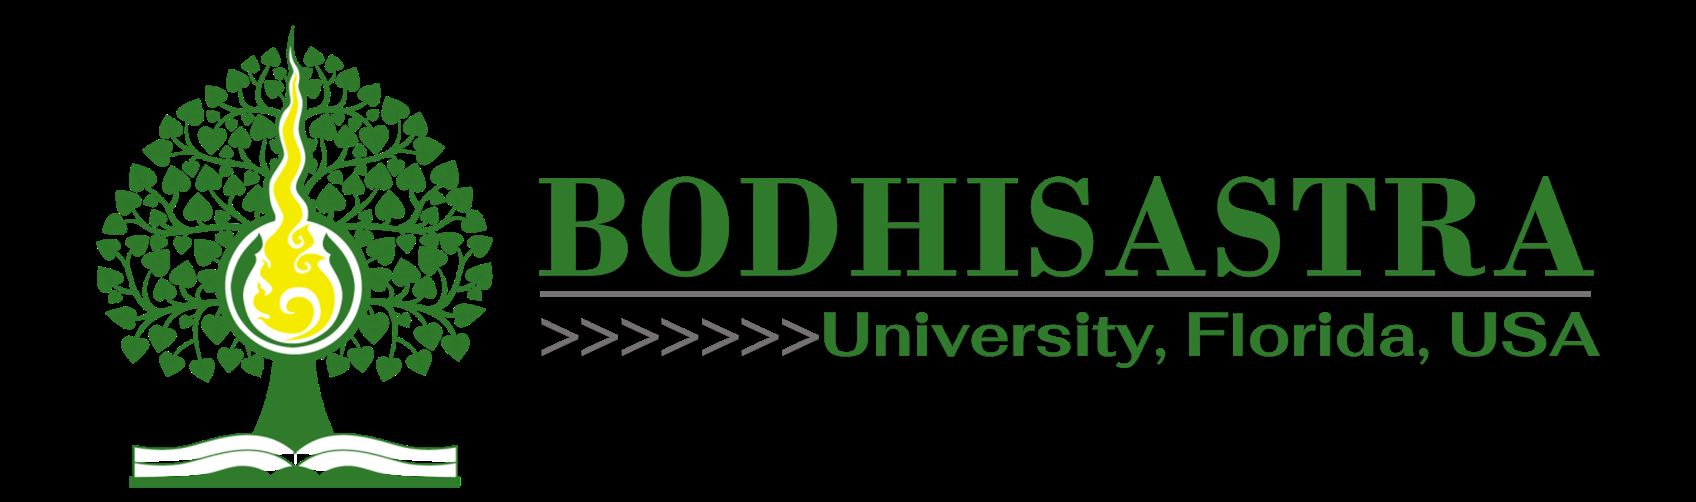 Bodhisastra University